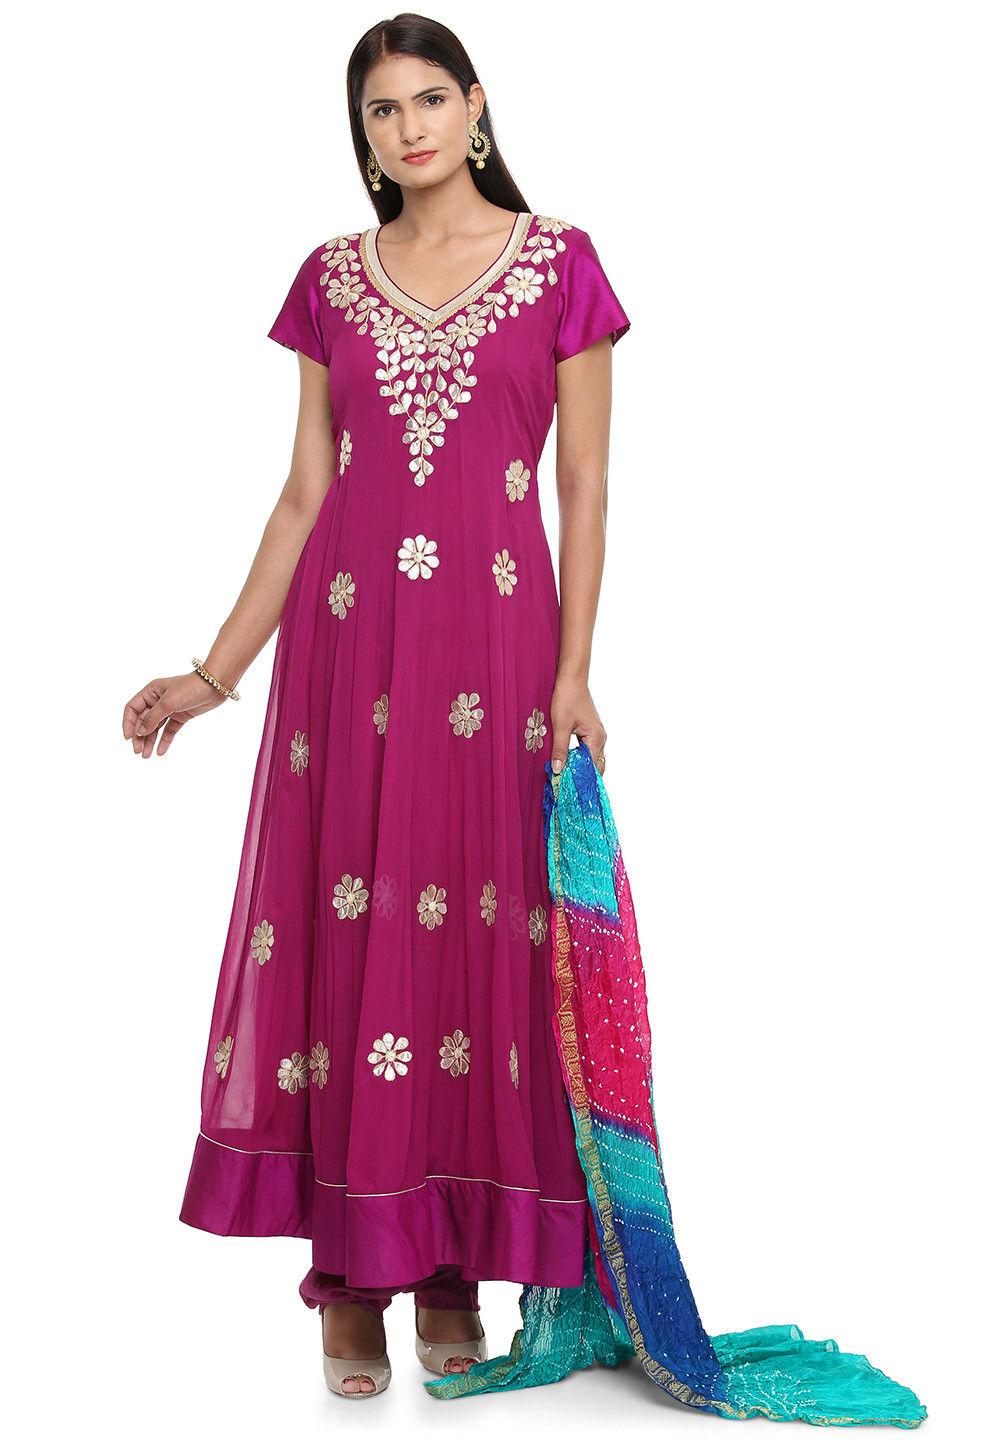 cf289f1c8a4 Embroidered Faux Georgette Anarkali Suit in Magenta   KJN3325